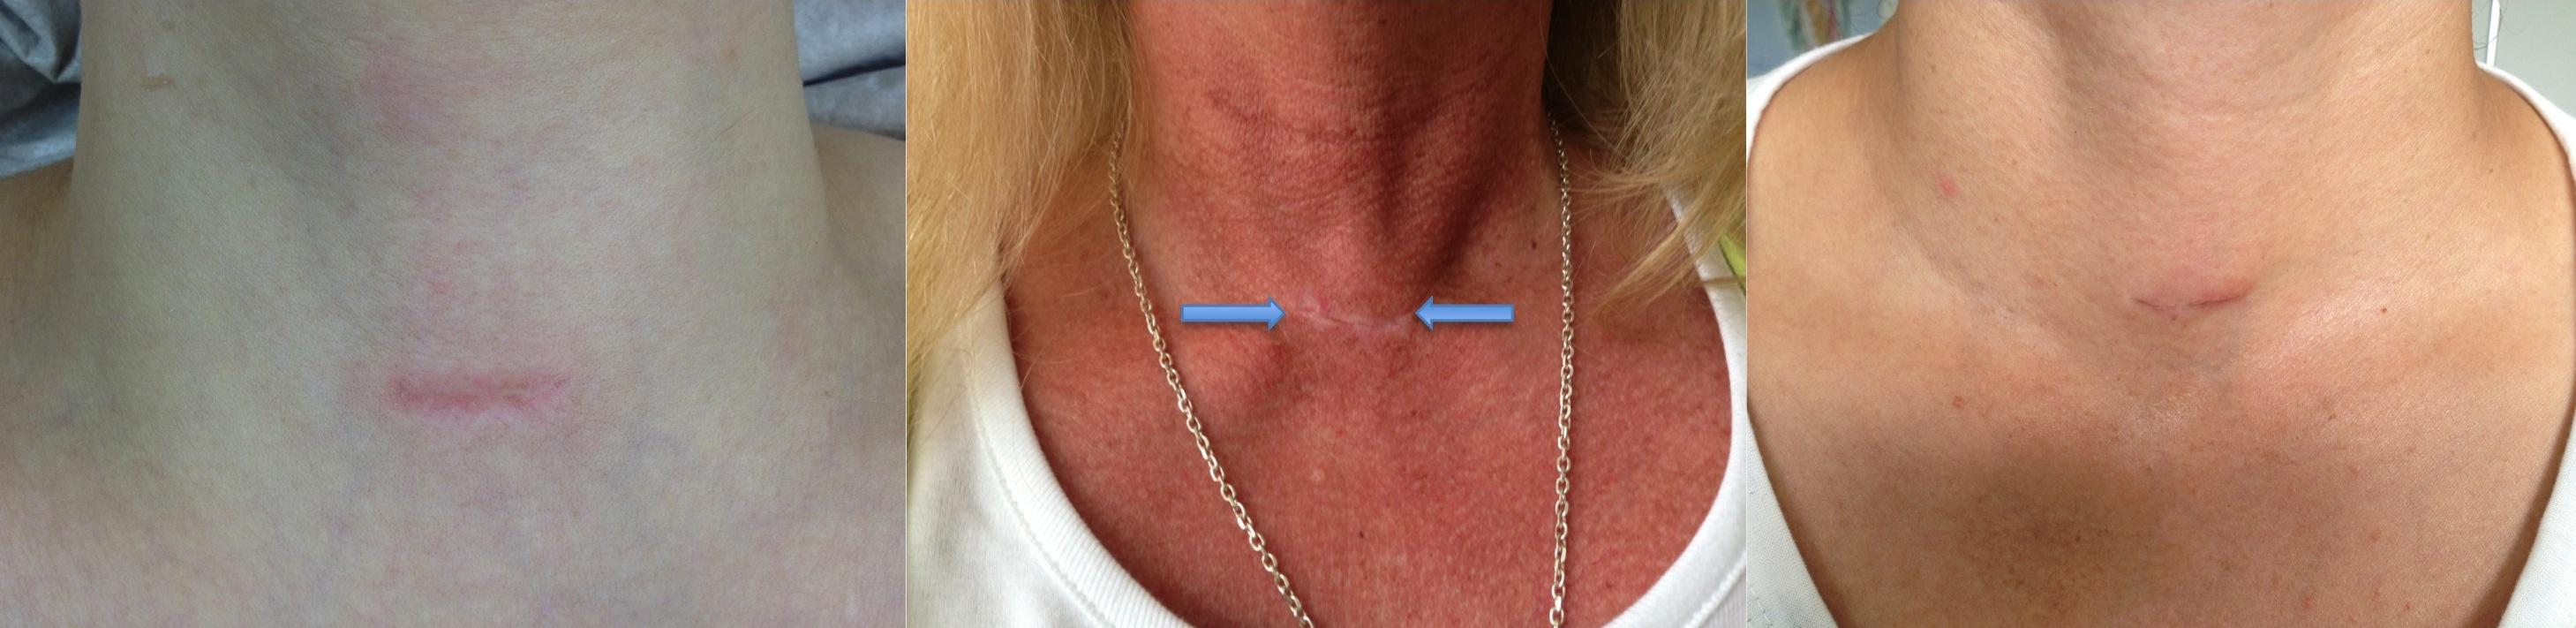 Endokrine Chirurgie: Uniklinik Essen